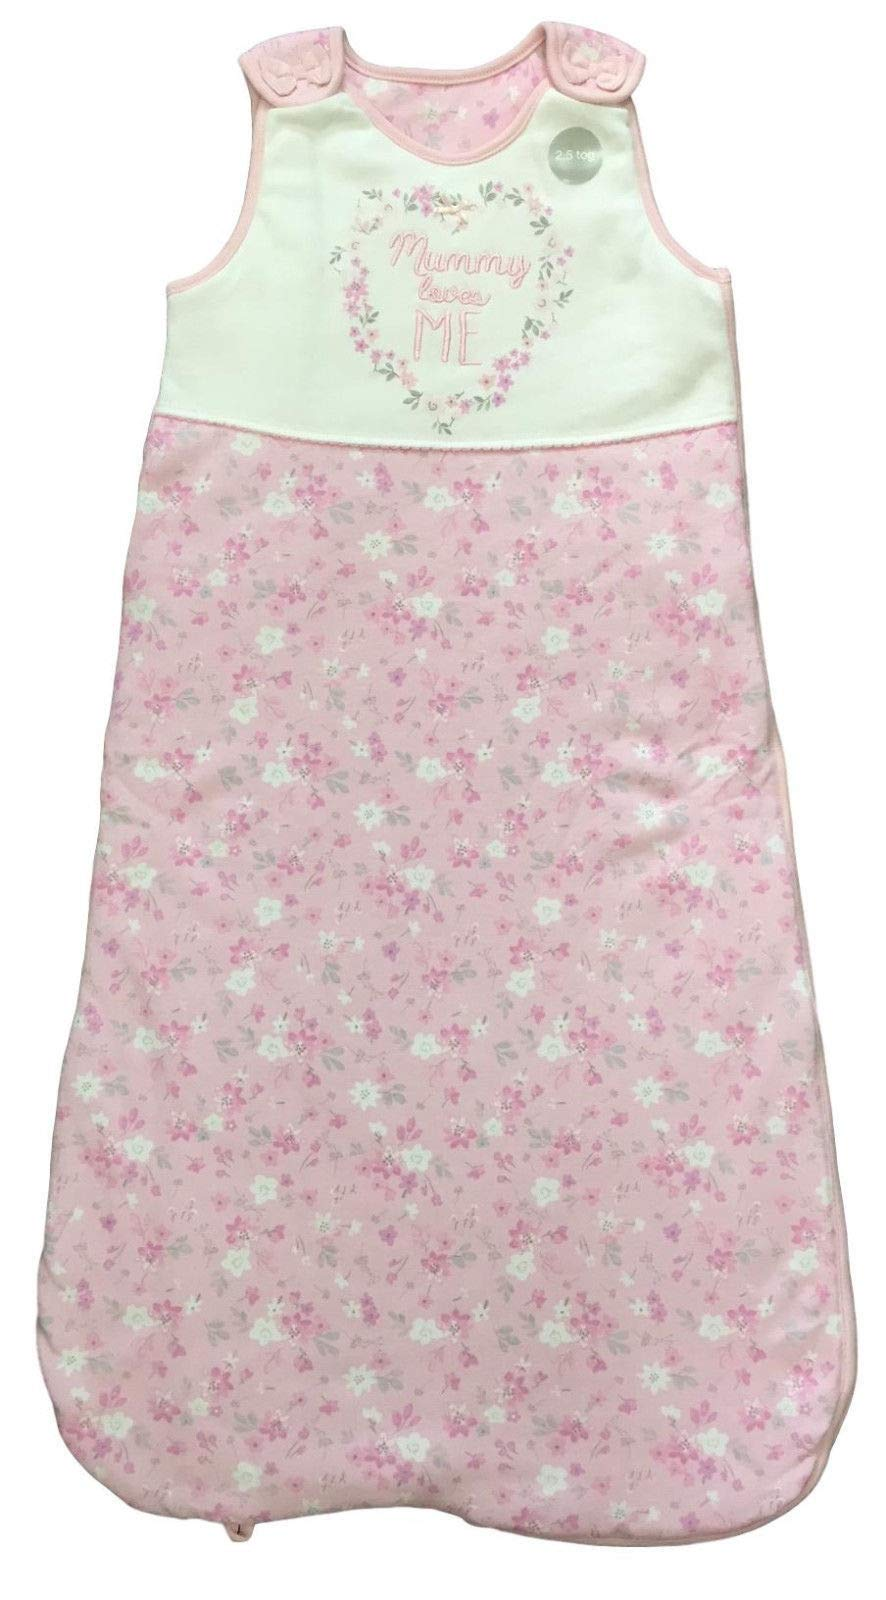 Baby Sleeping Bag Girls Boys 1 1.5 2.5 Tog Cotton Growbag Sleep Safety Blanket